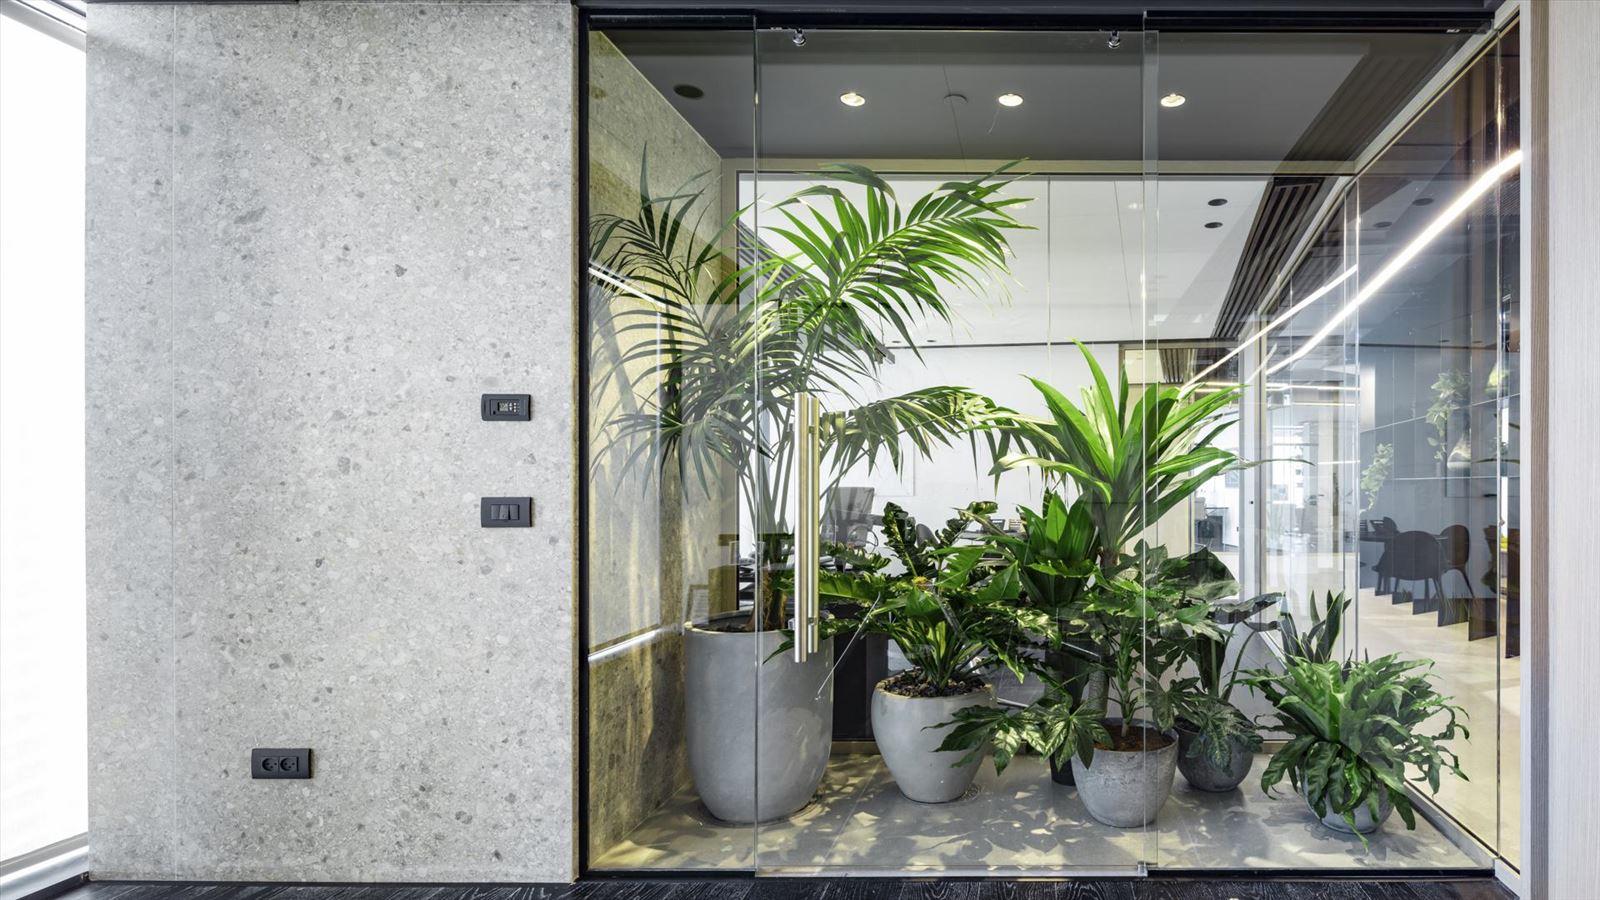 Fortissimo Offices – Tel Aviv גופי תאורה מיוחדים על צמחיית המשרד נעשה על ידי דורי קמחי